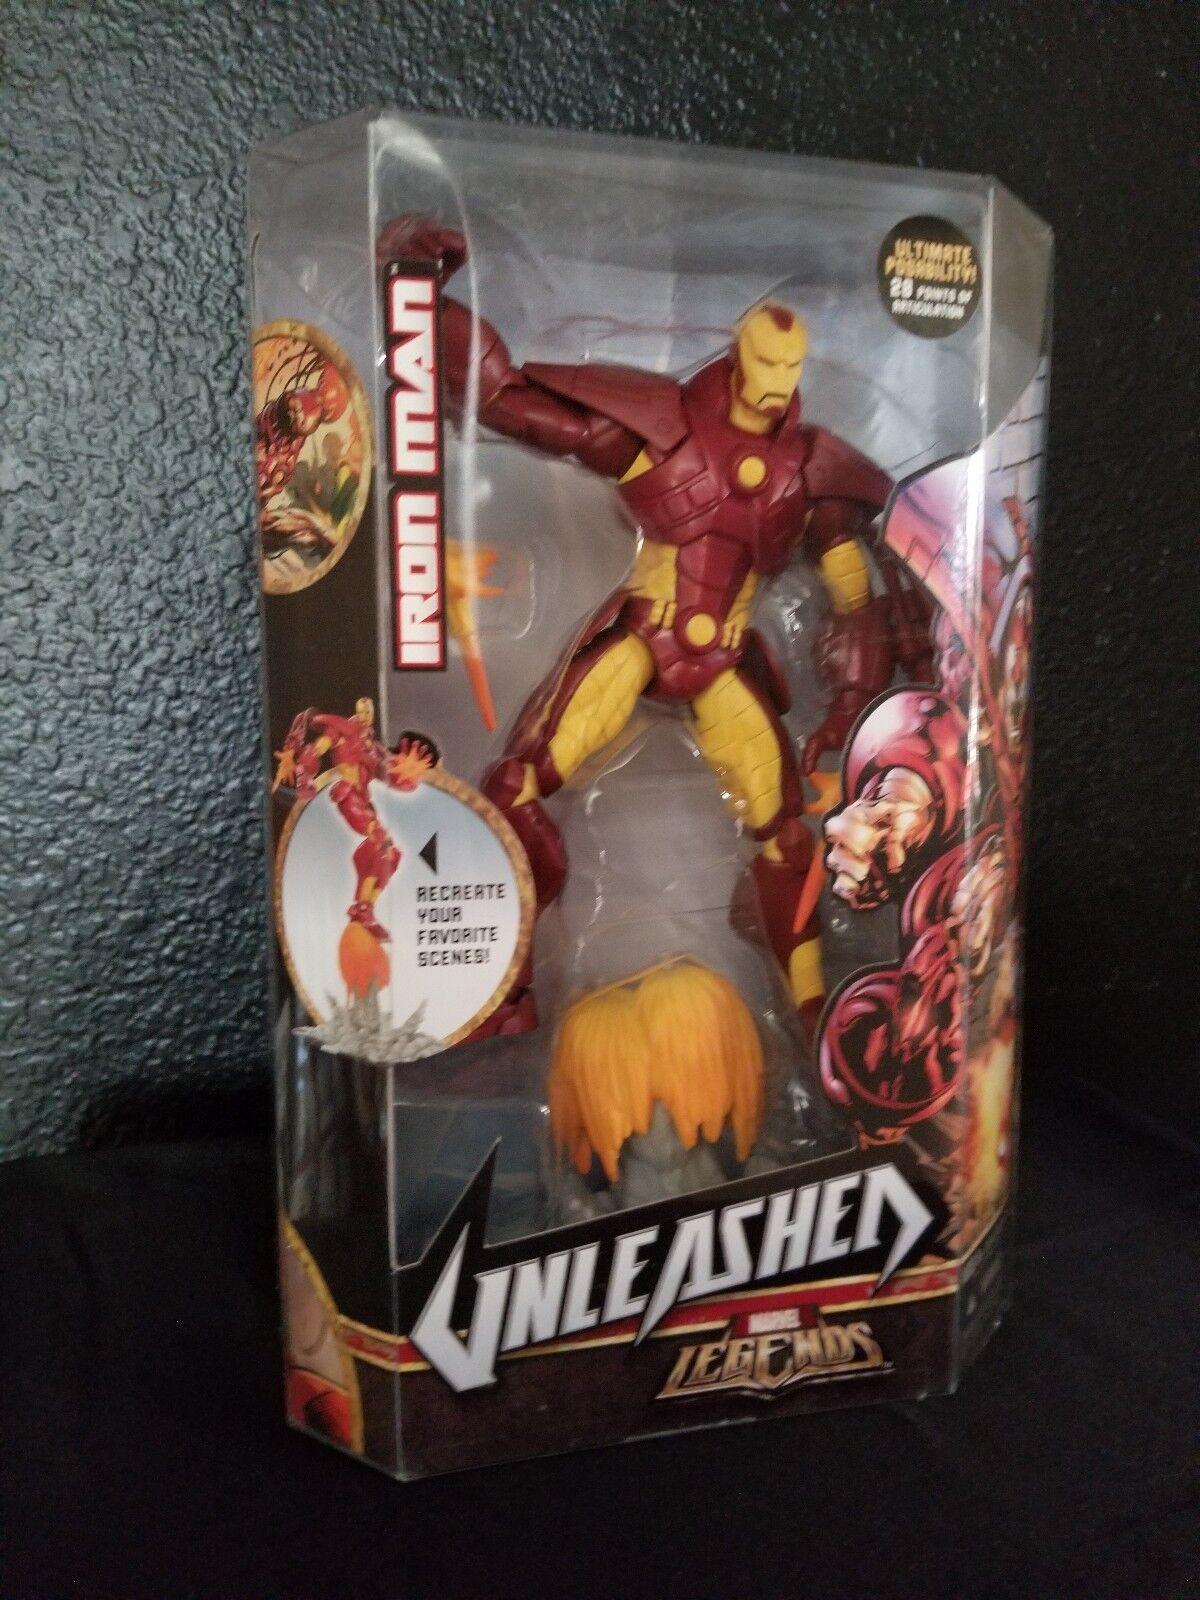 Iron man - entfesselt stark rstung 2008 marvel - legenden 8.